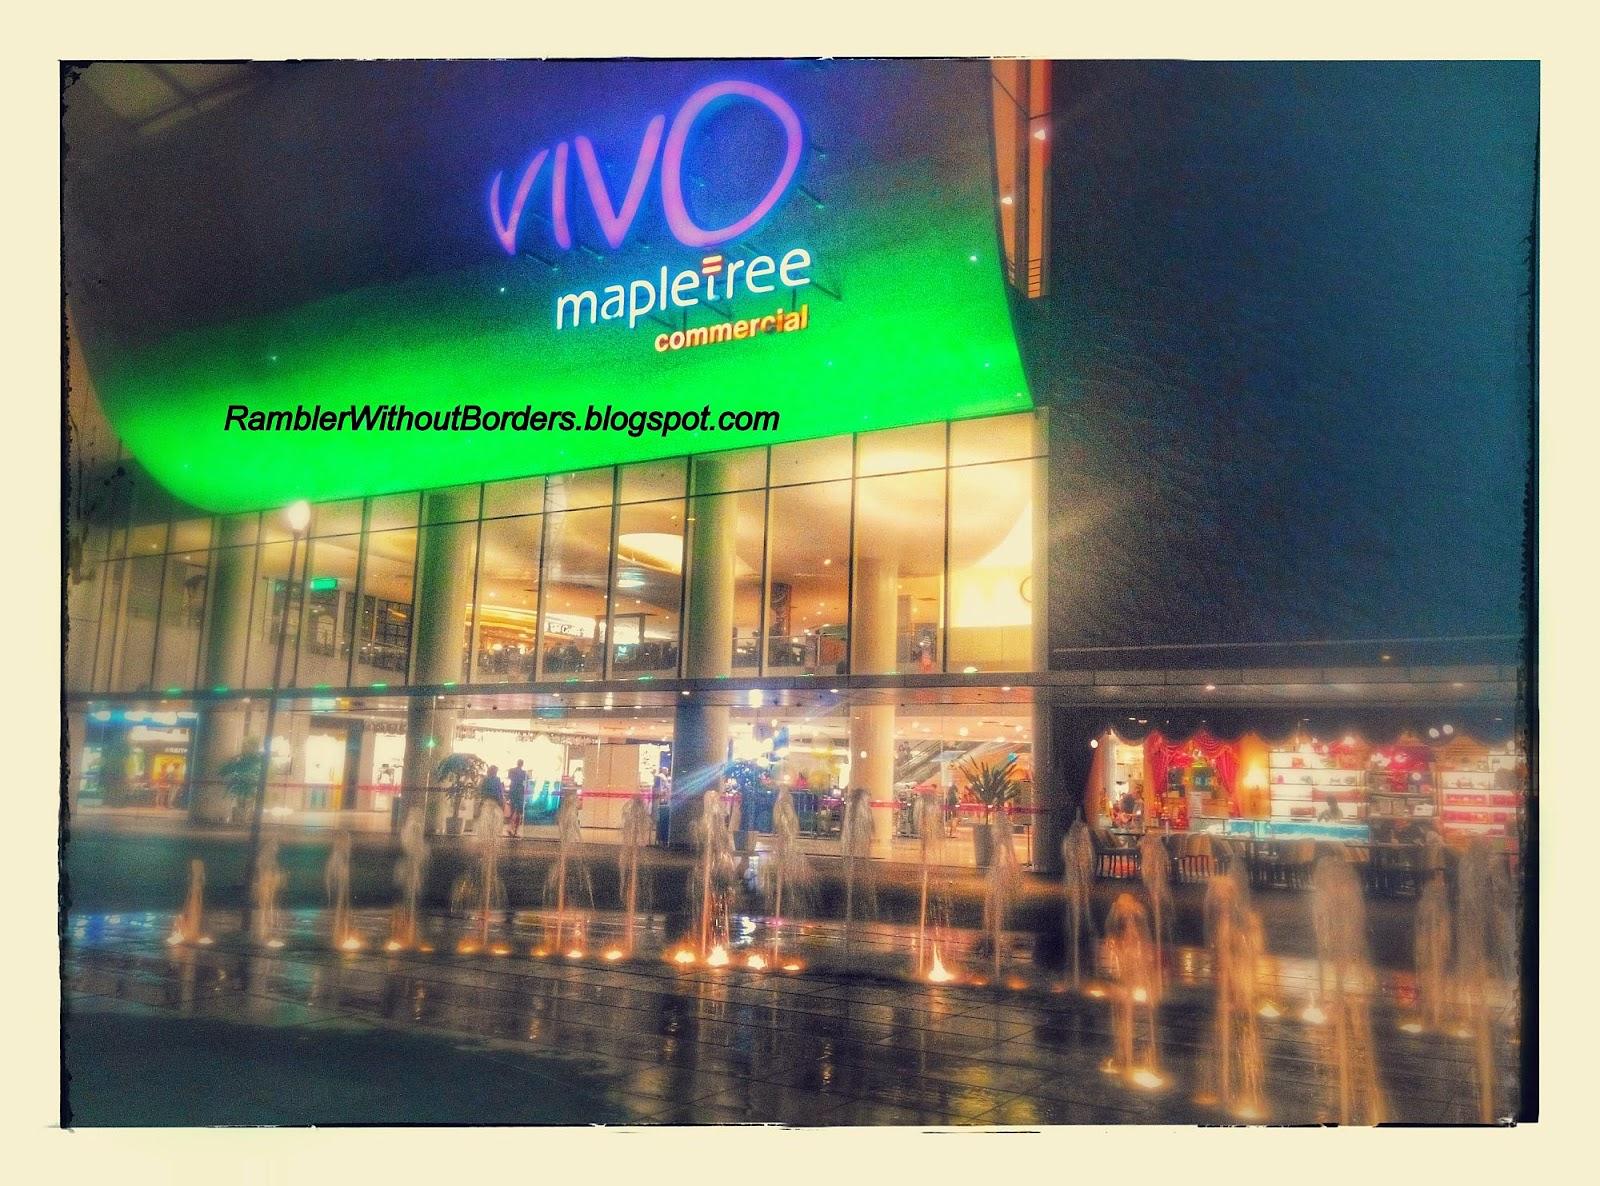 Vivocity shopping mall, Singapore